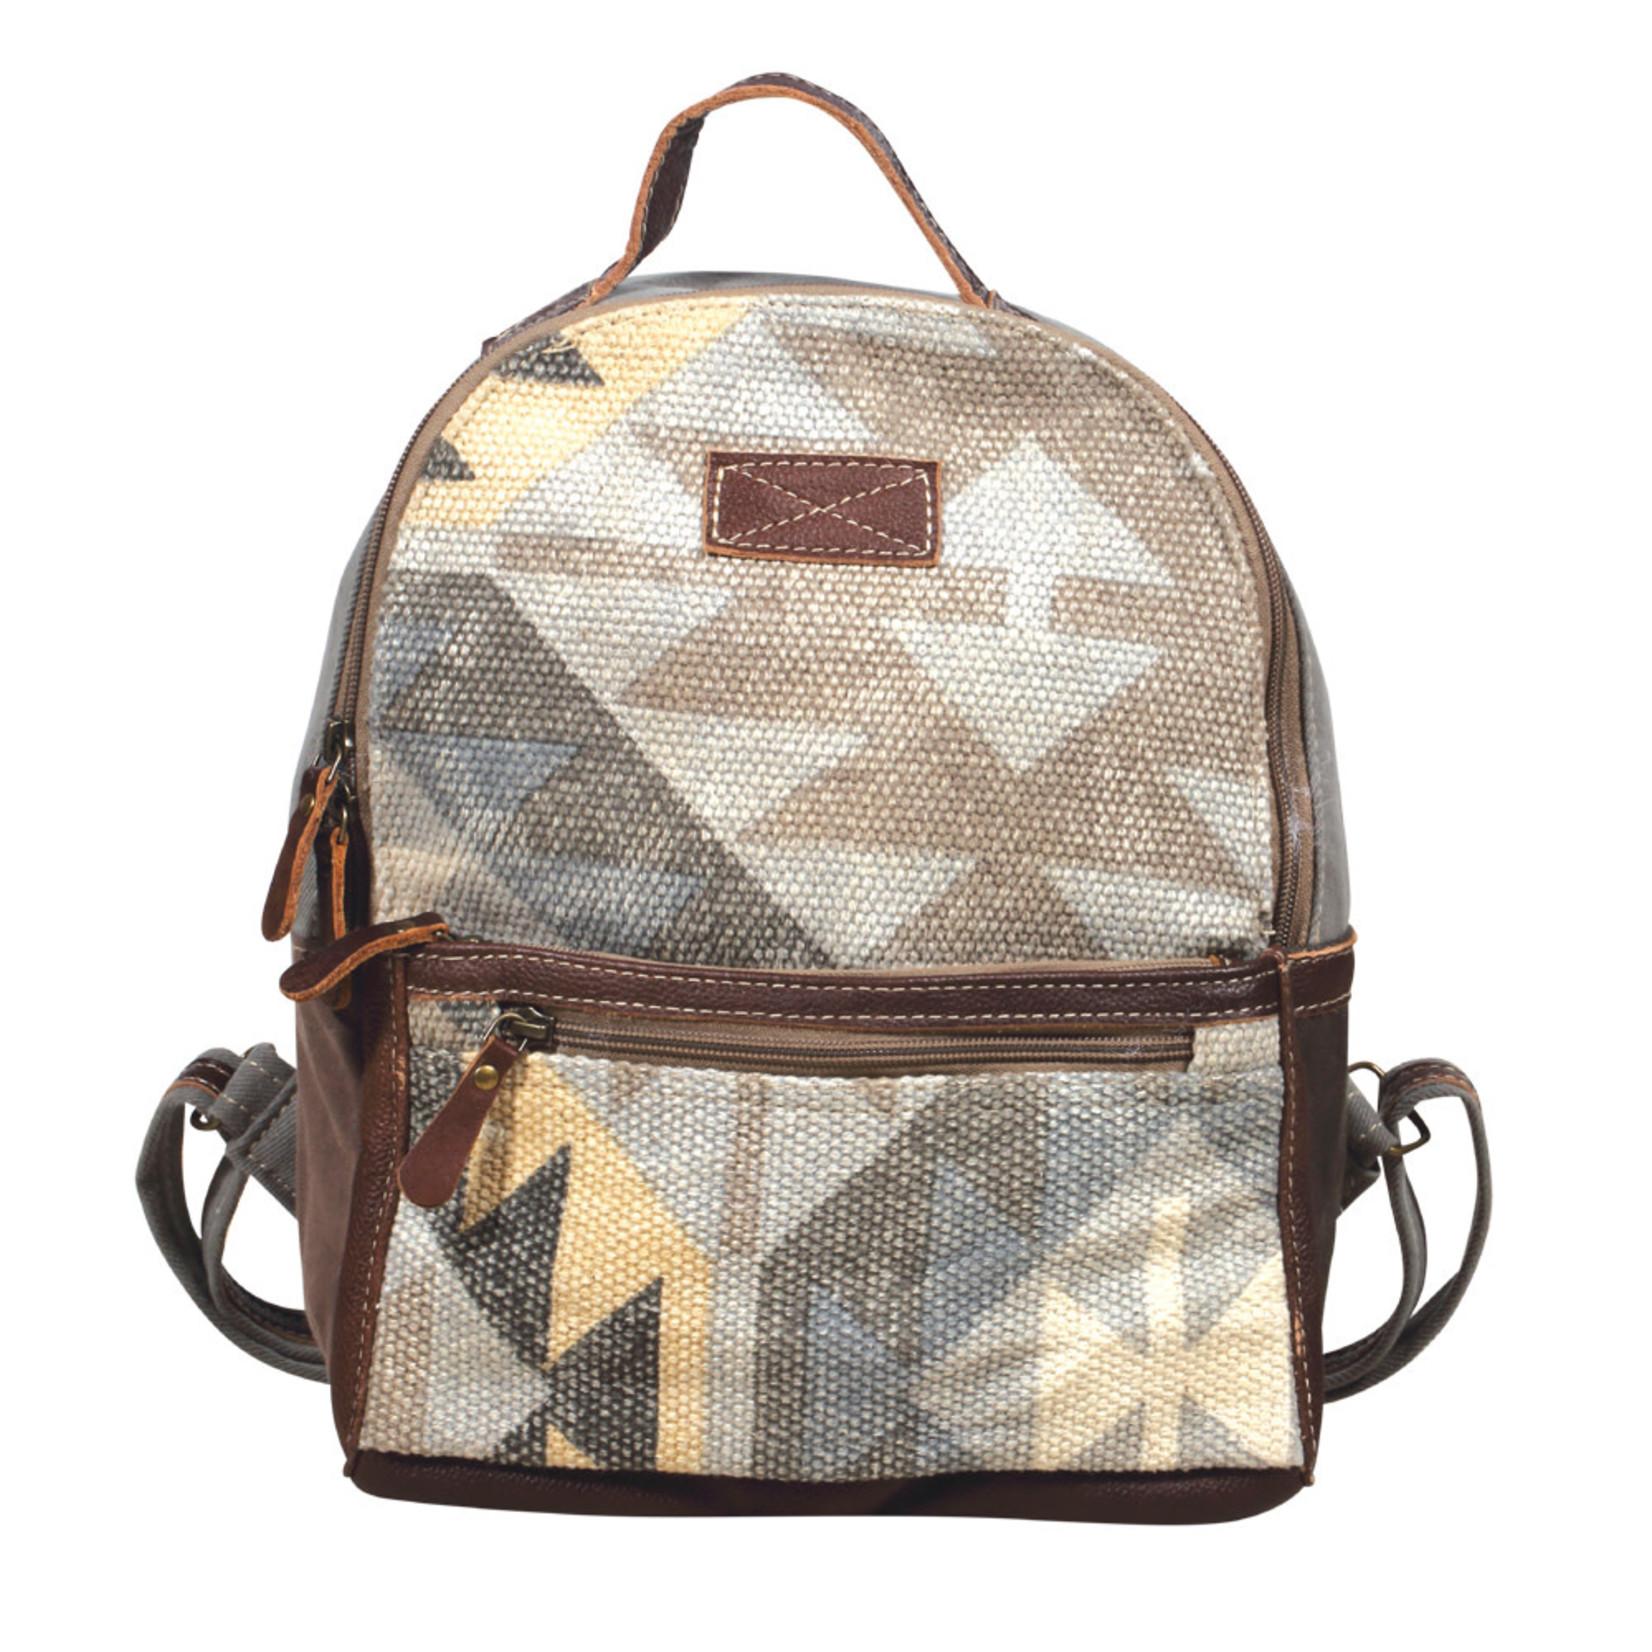 Myra Bags S-2024 Endearing Backpack Bag